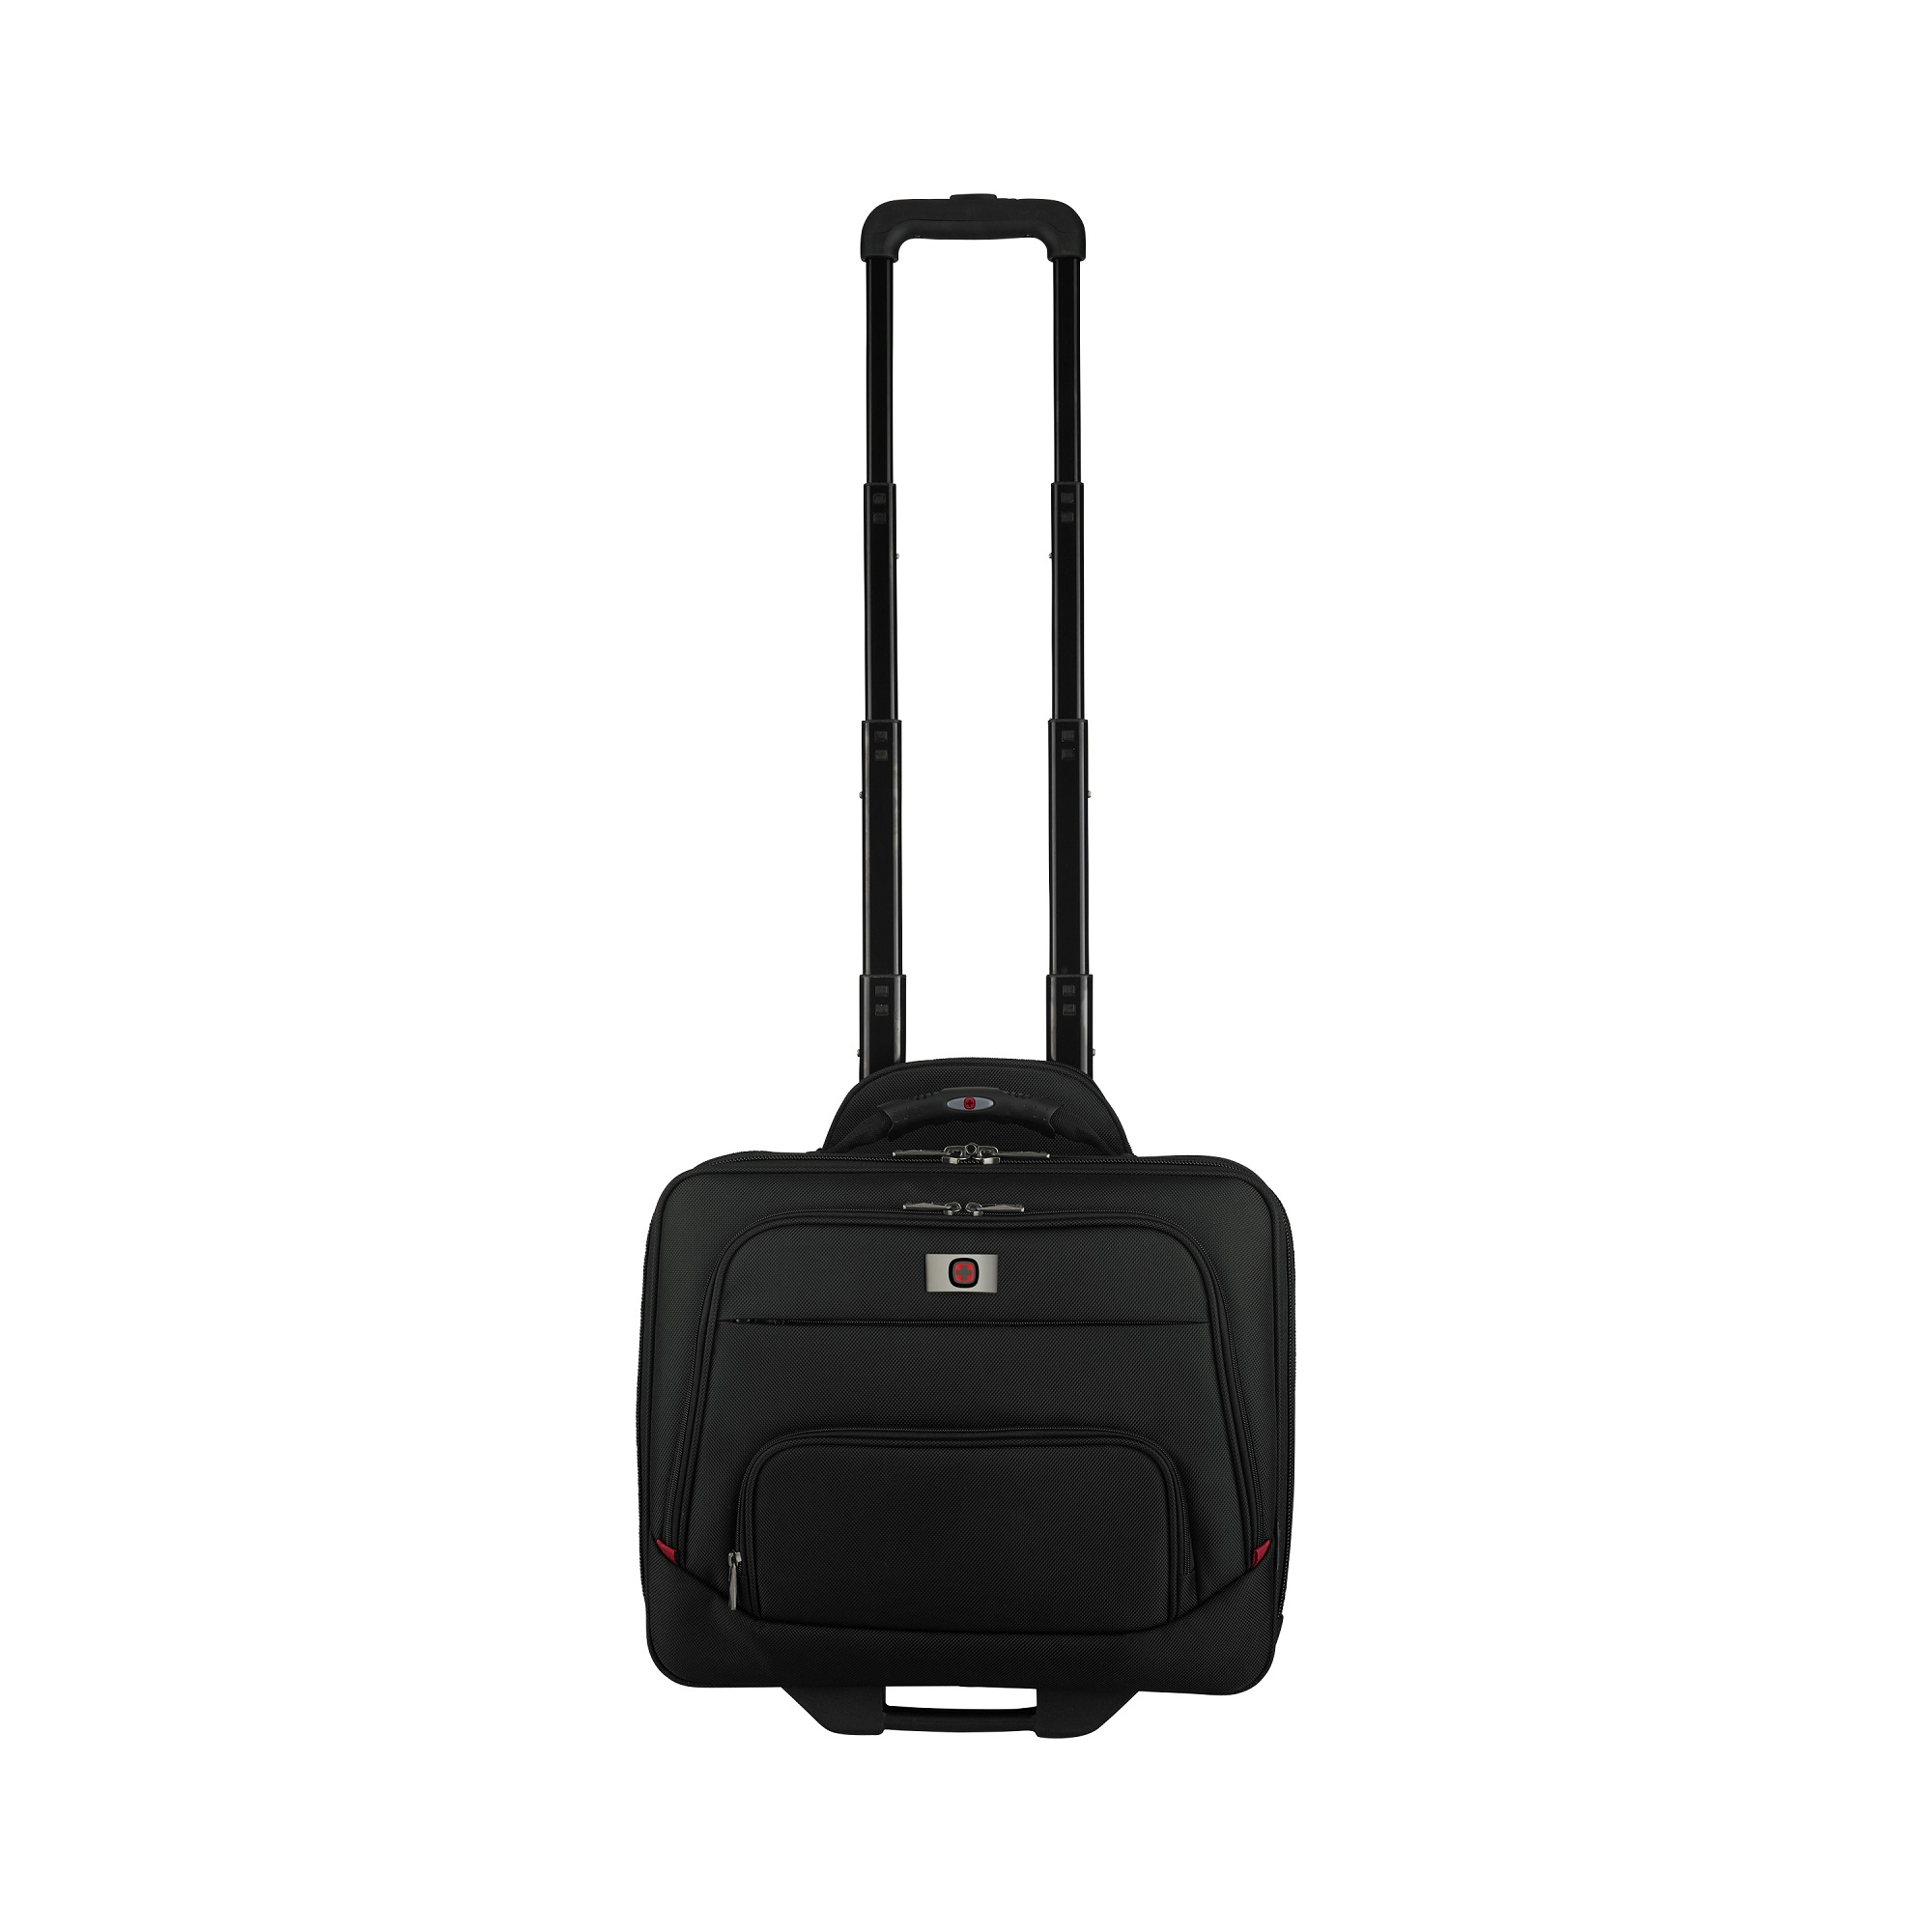 Wenger 605978 Spheria 16 Wheeled Laptop Case Roller Traveling Trolley Bag Essentials Organiser Black